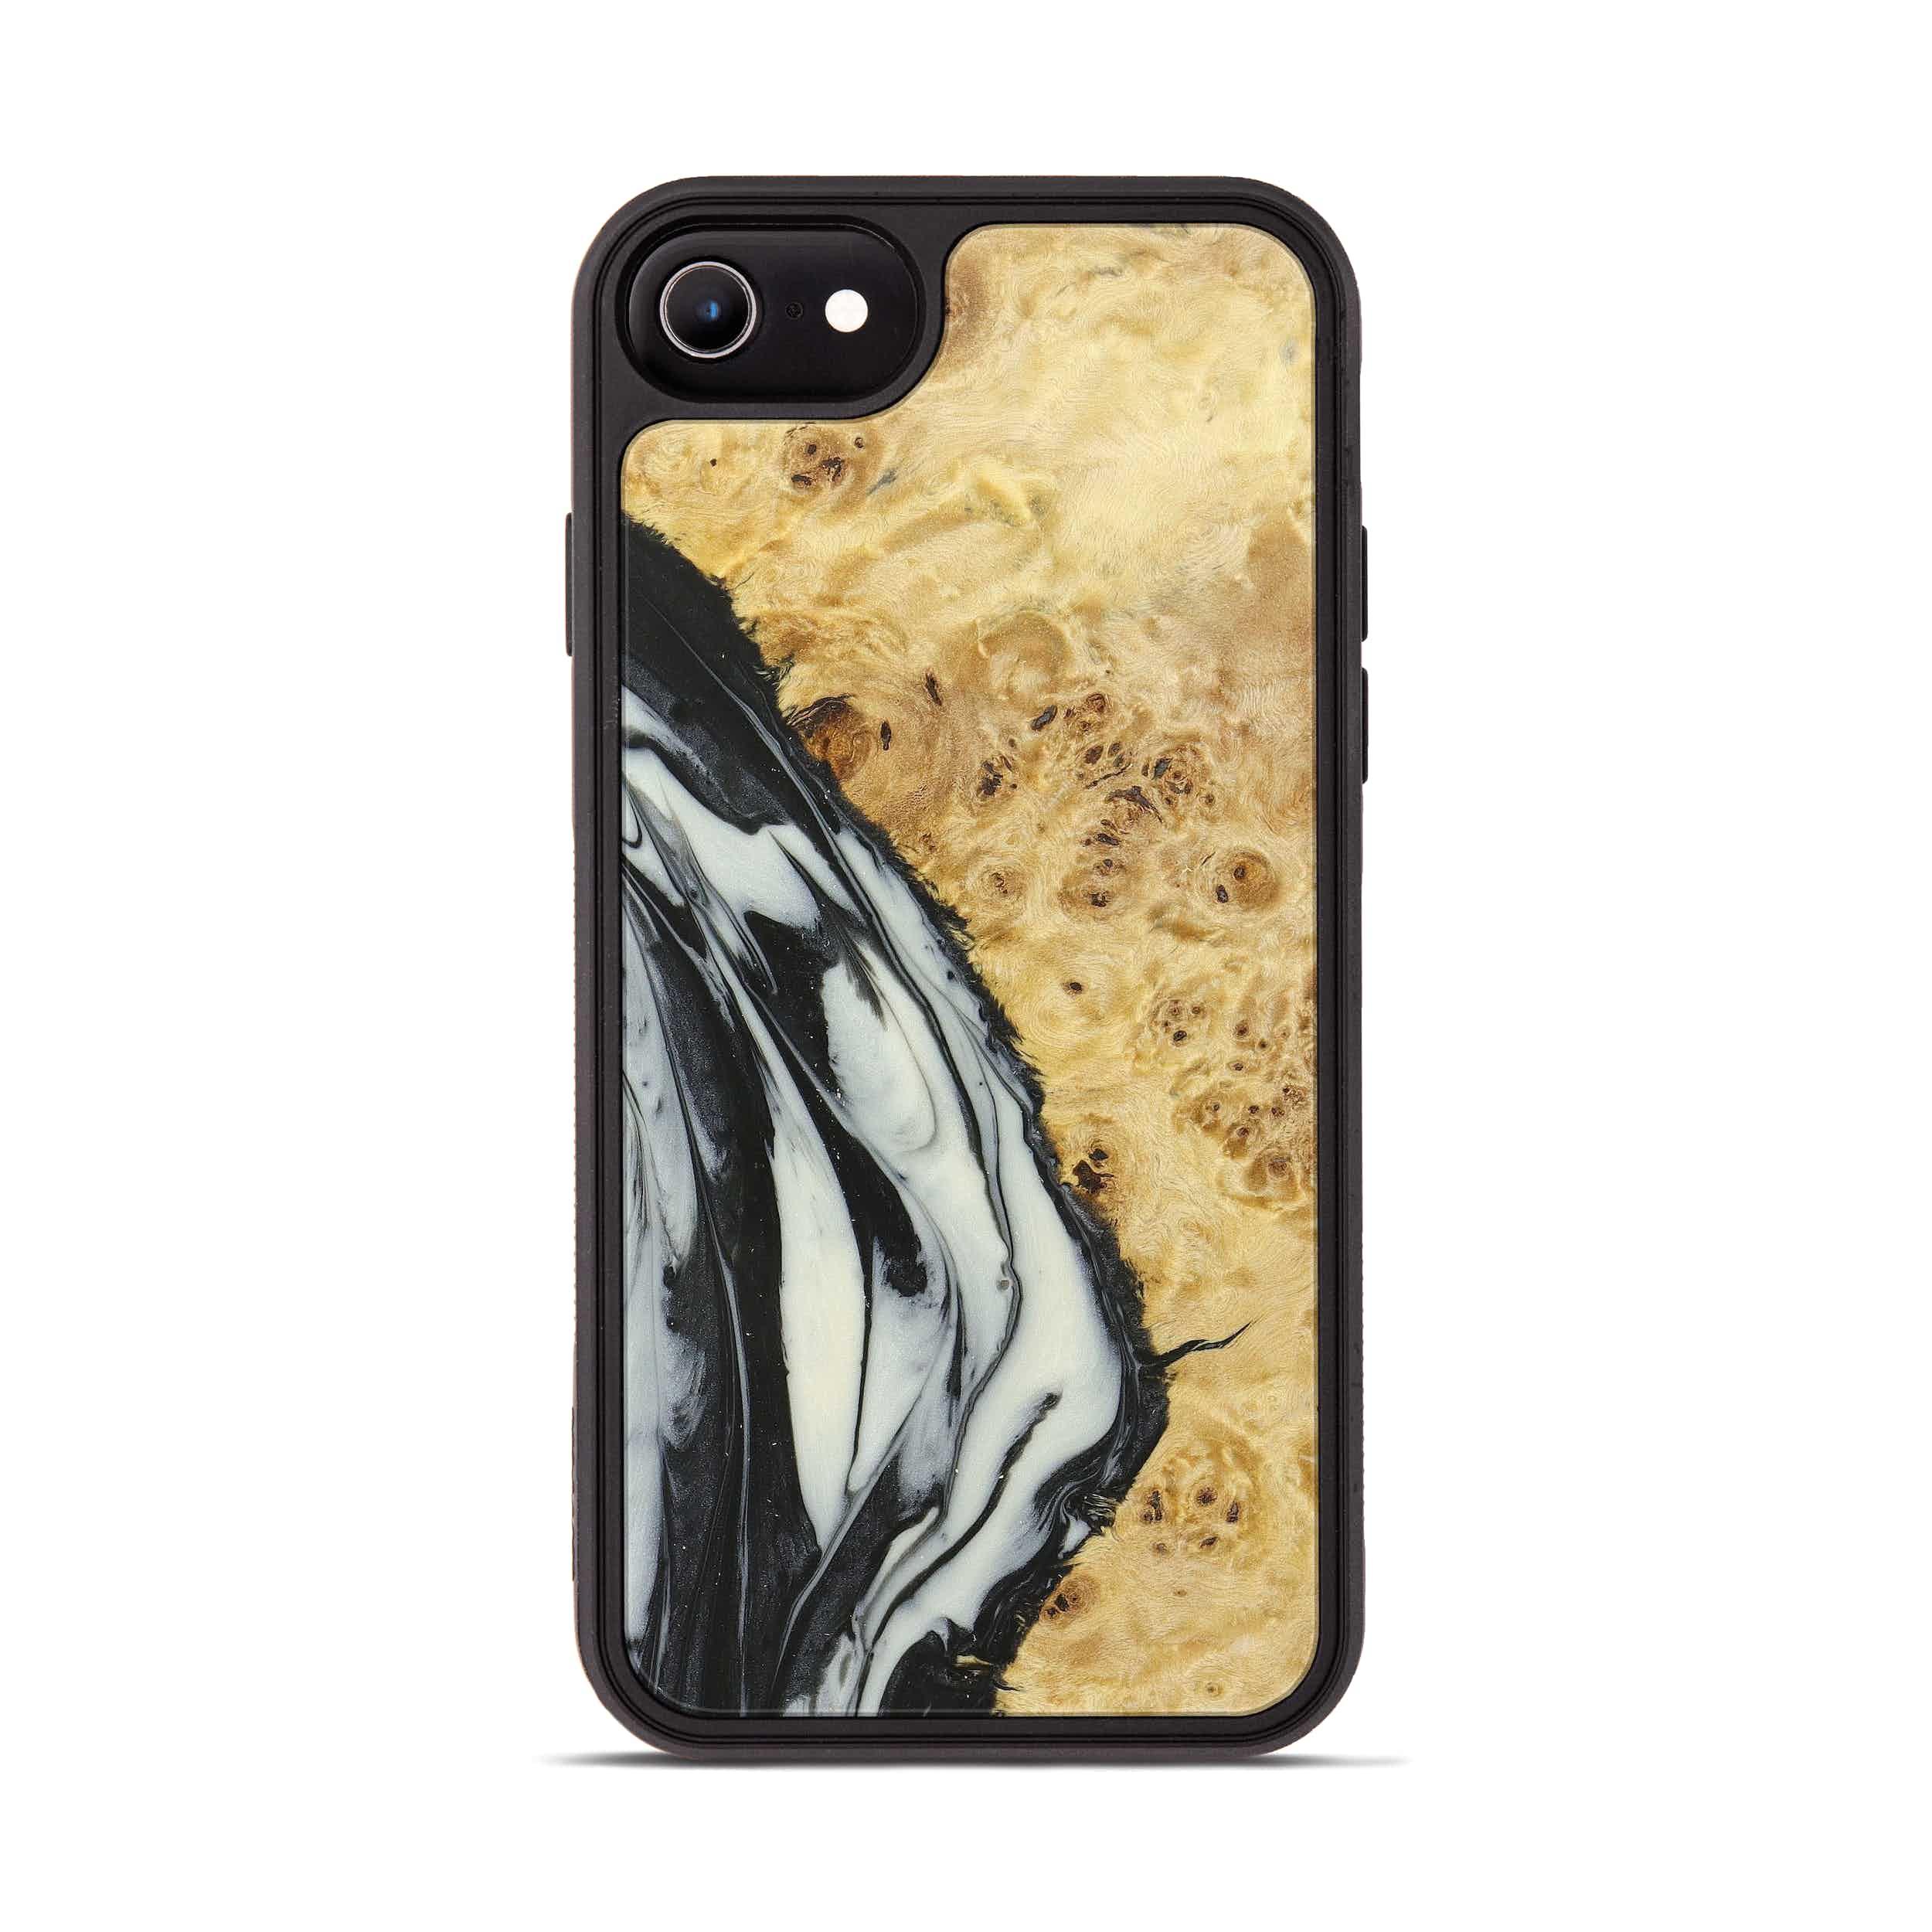 iPhone 8 Wood+Resin Phone Case - Deanne (Black & White, 358002)